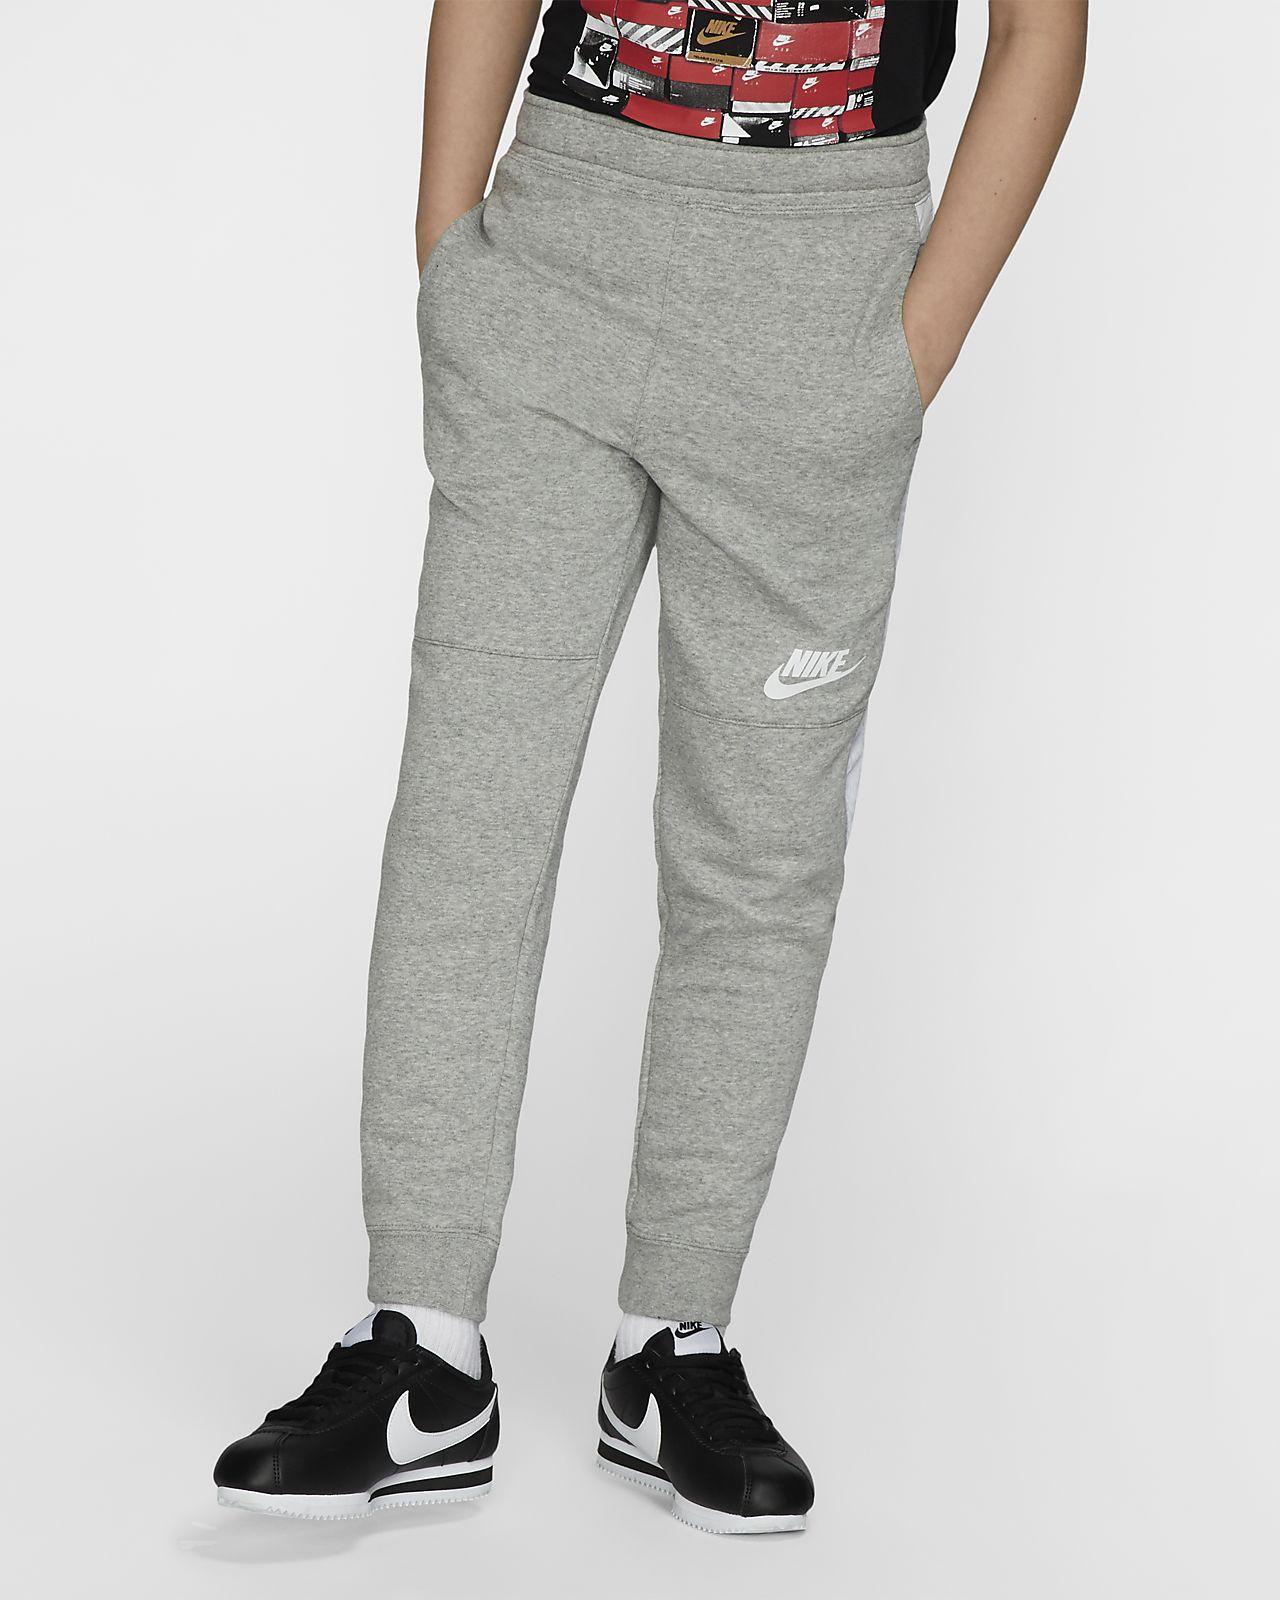 2efb78e54 Nike Sportswear joggebukse til store barn